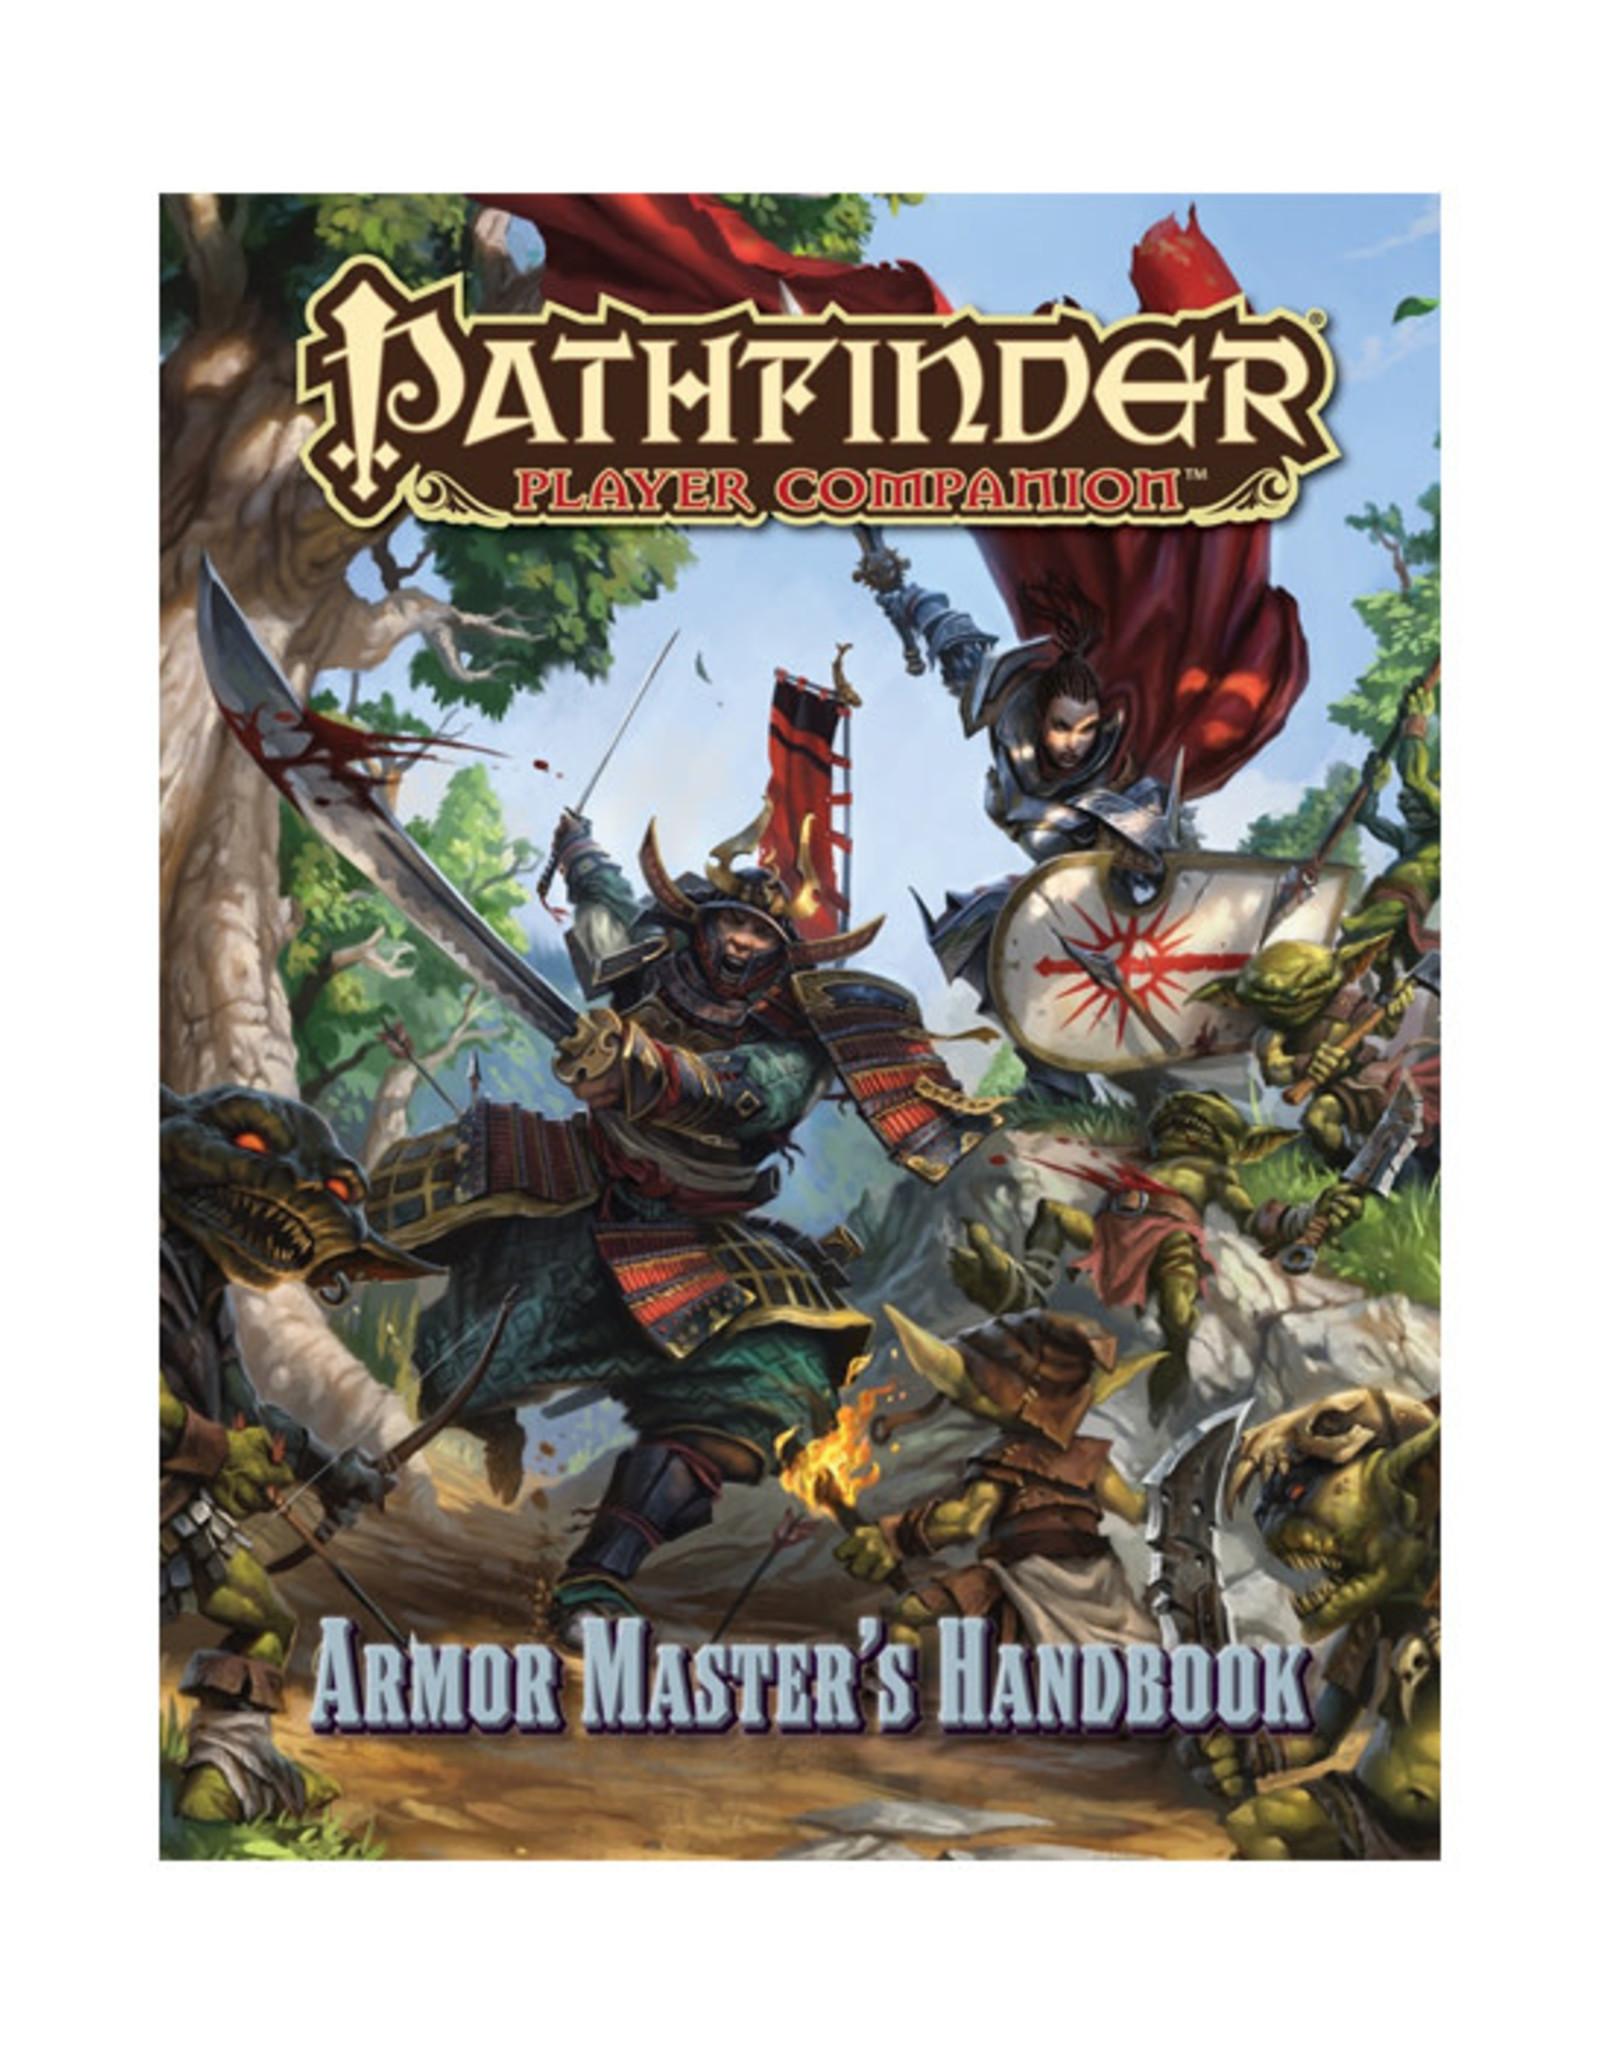 Pathfinder Pathfinder: Player Companion - Armor Master's Handbook